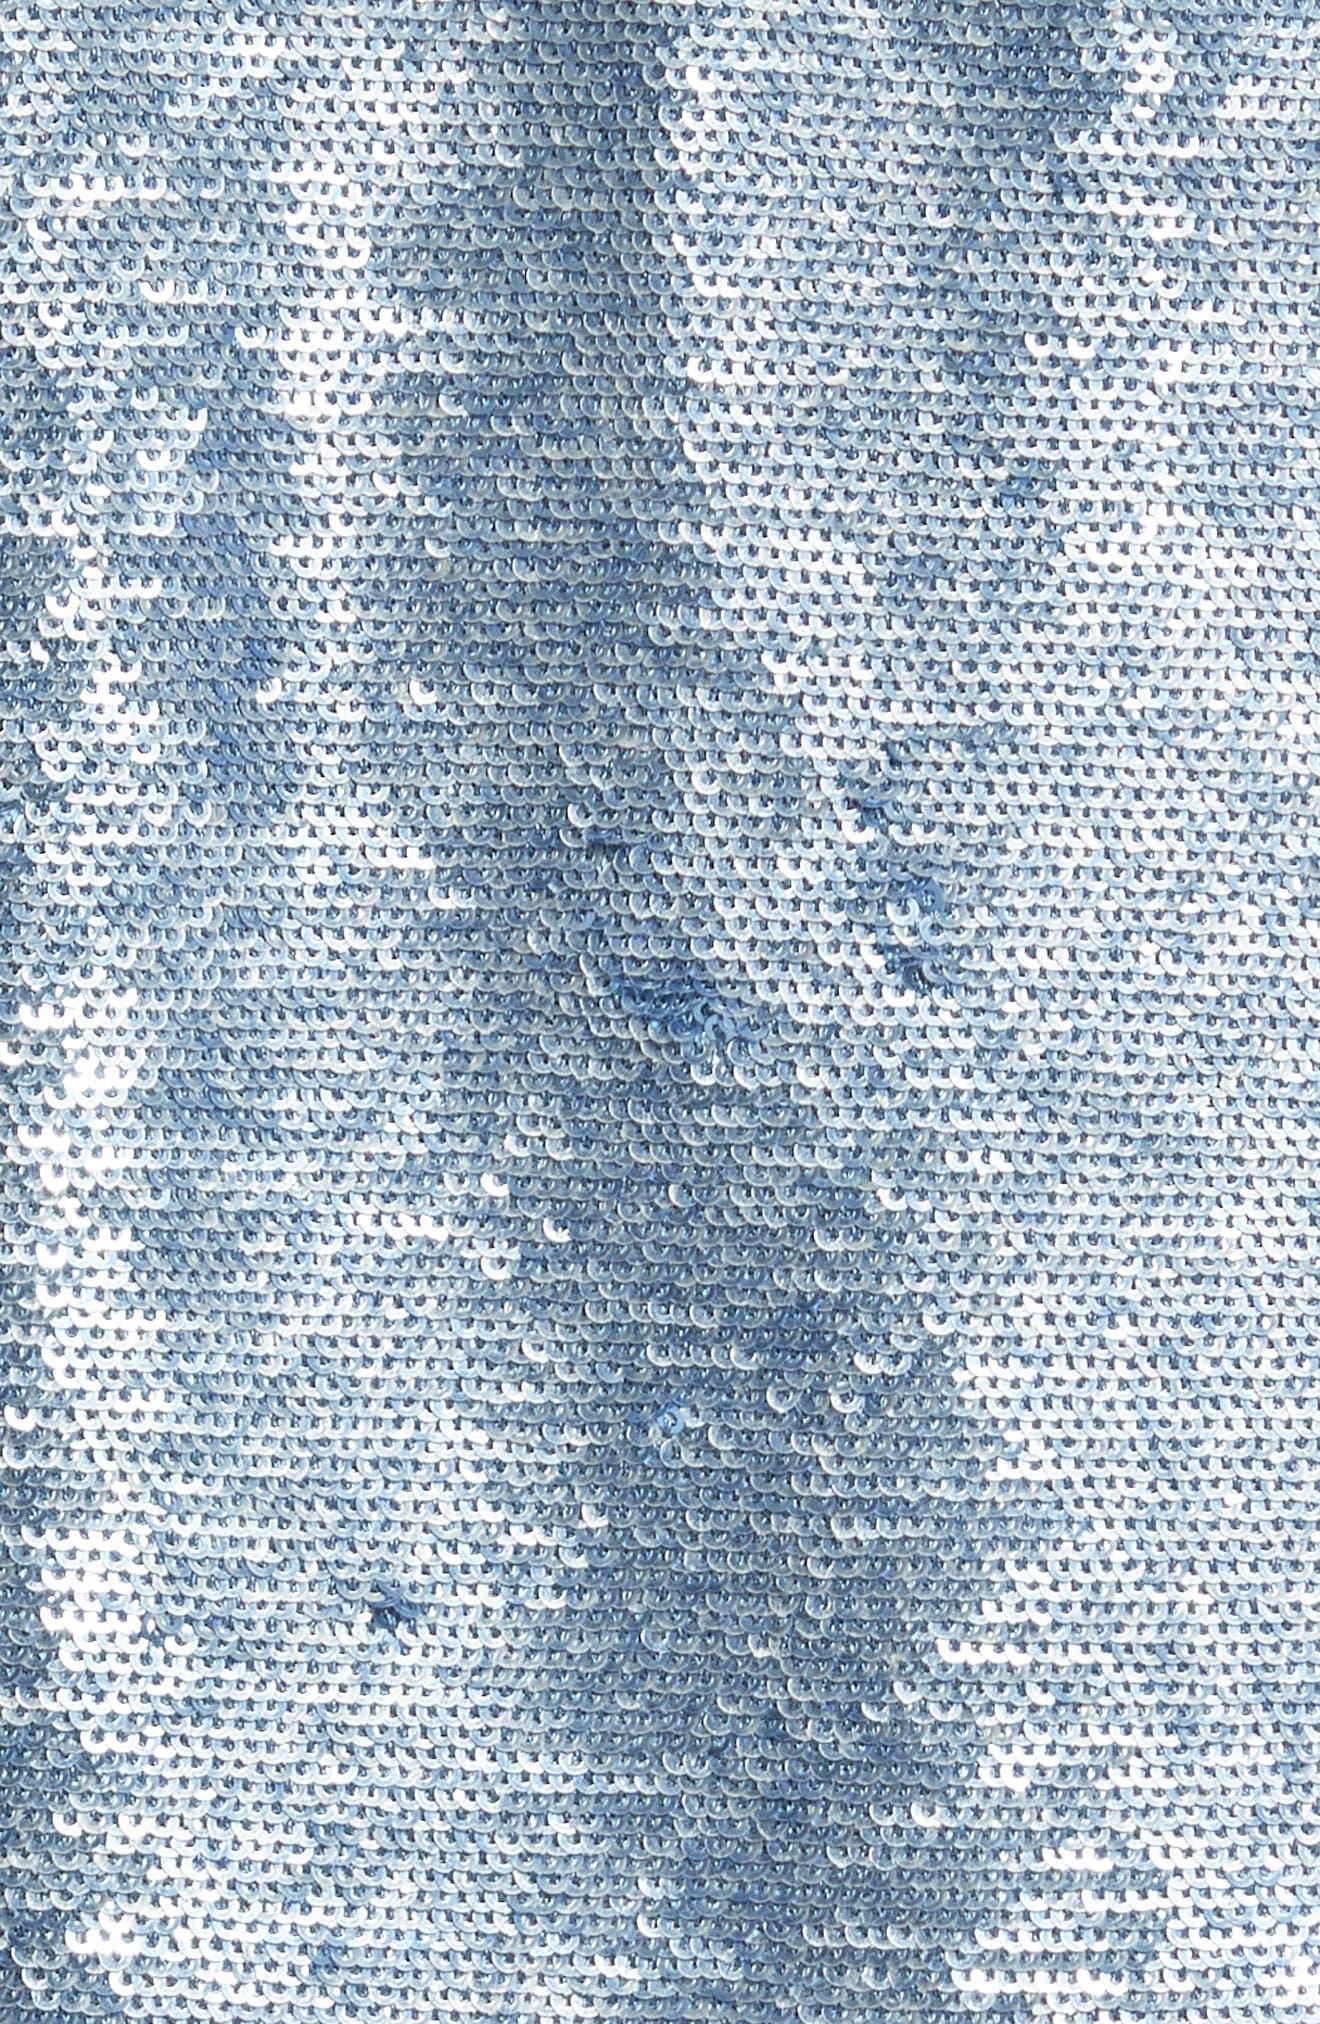 Dalome Sequin Jacket,                             Alternate thumbnail 5, color,                             Blushed Blue